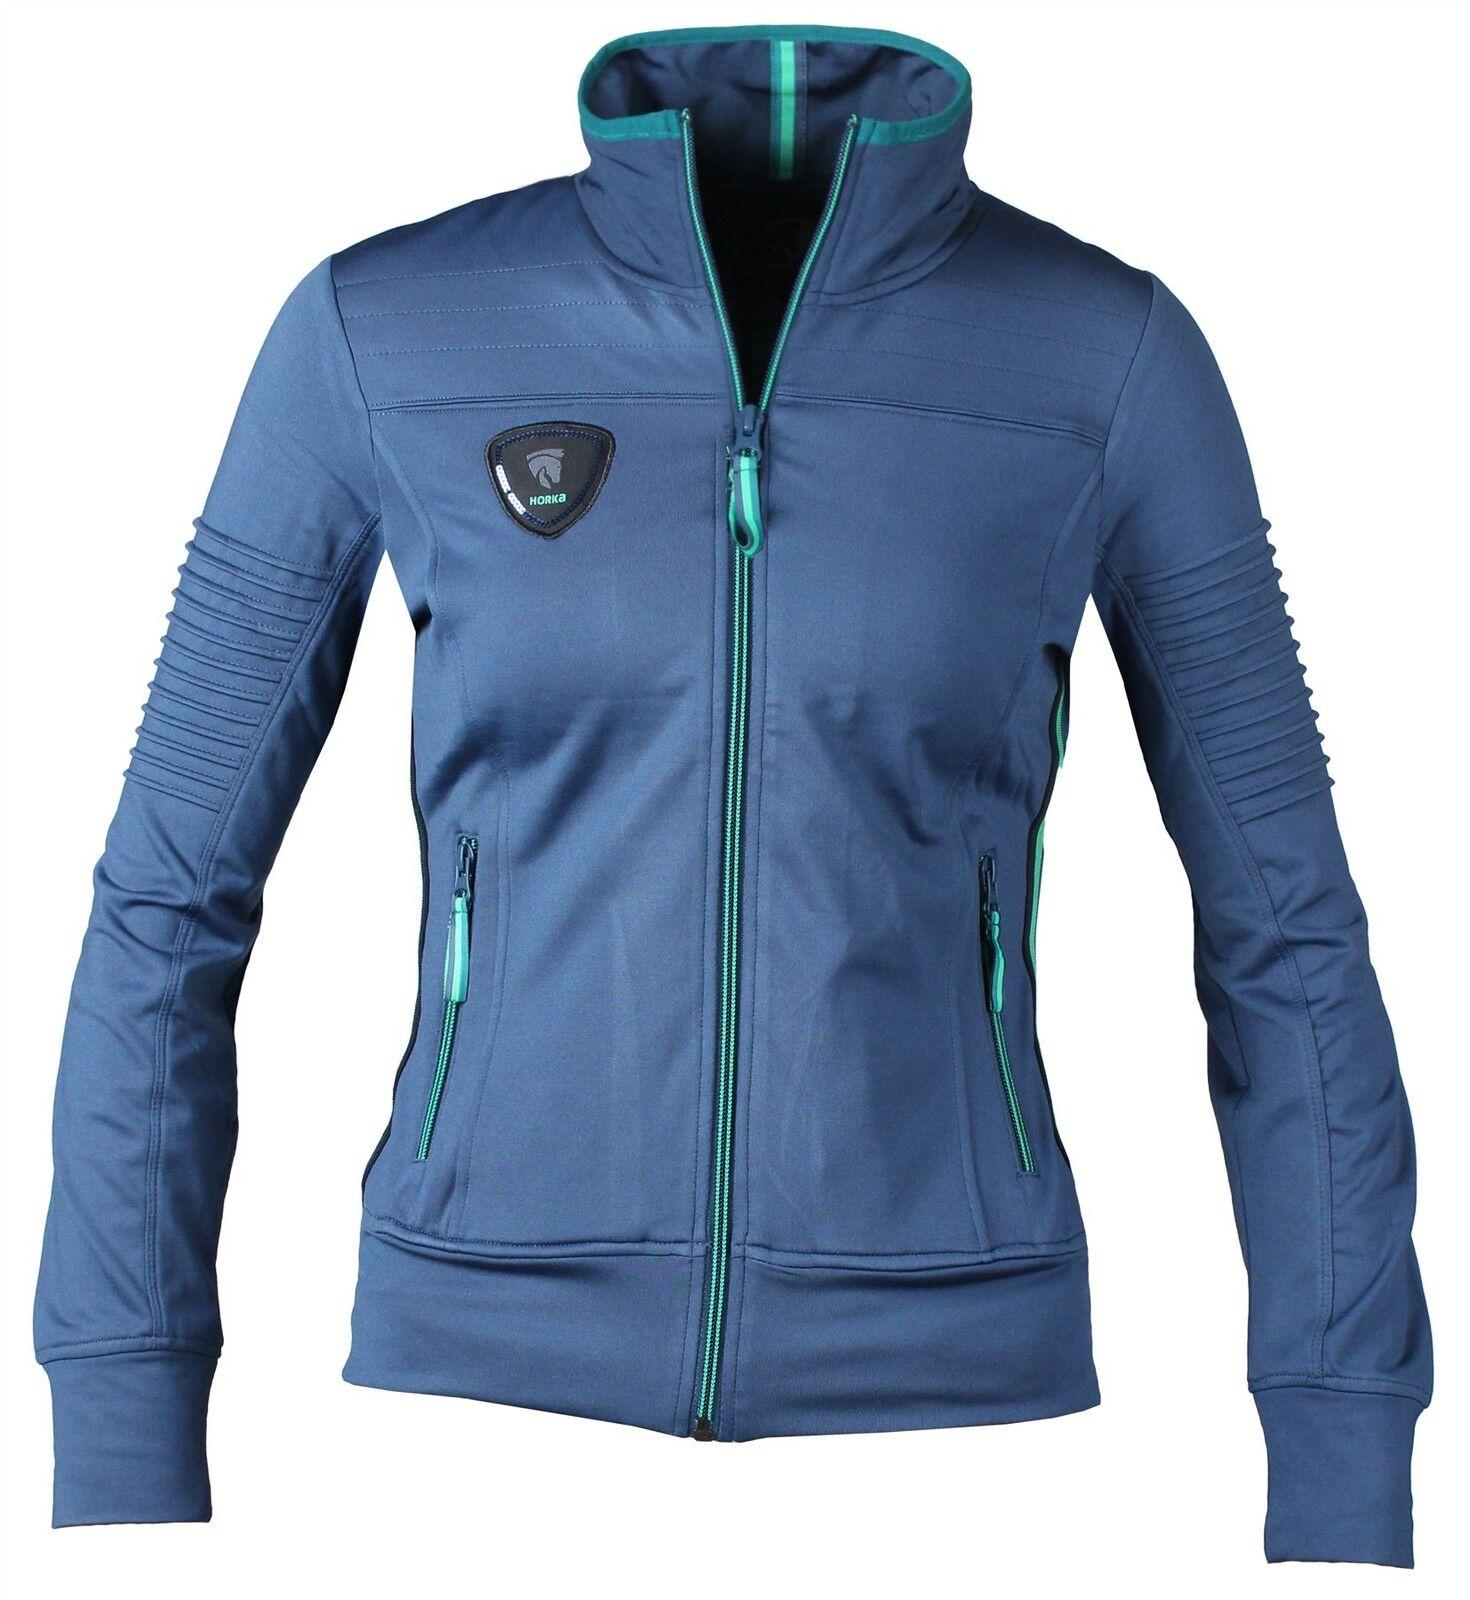 Horka Horka Horka Equestrian Ladies Florida Sweater Front Badge Lightweight & Breathable 60c1fc